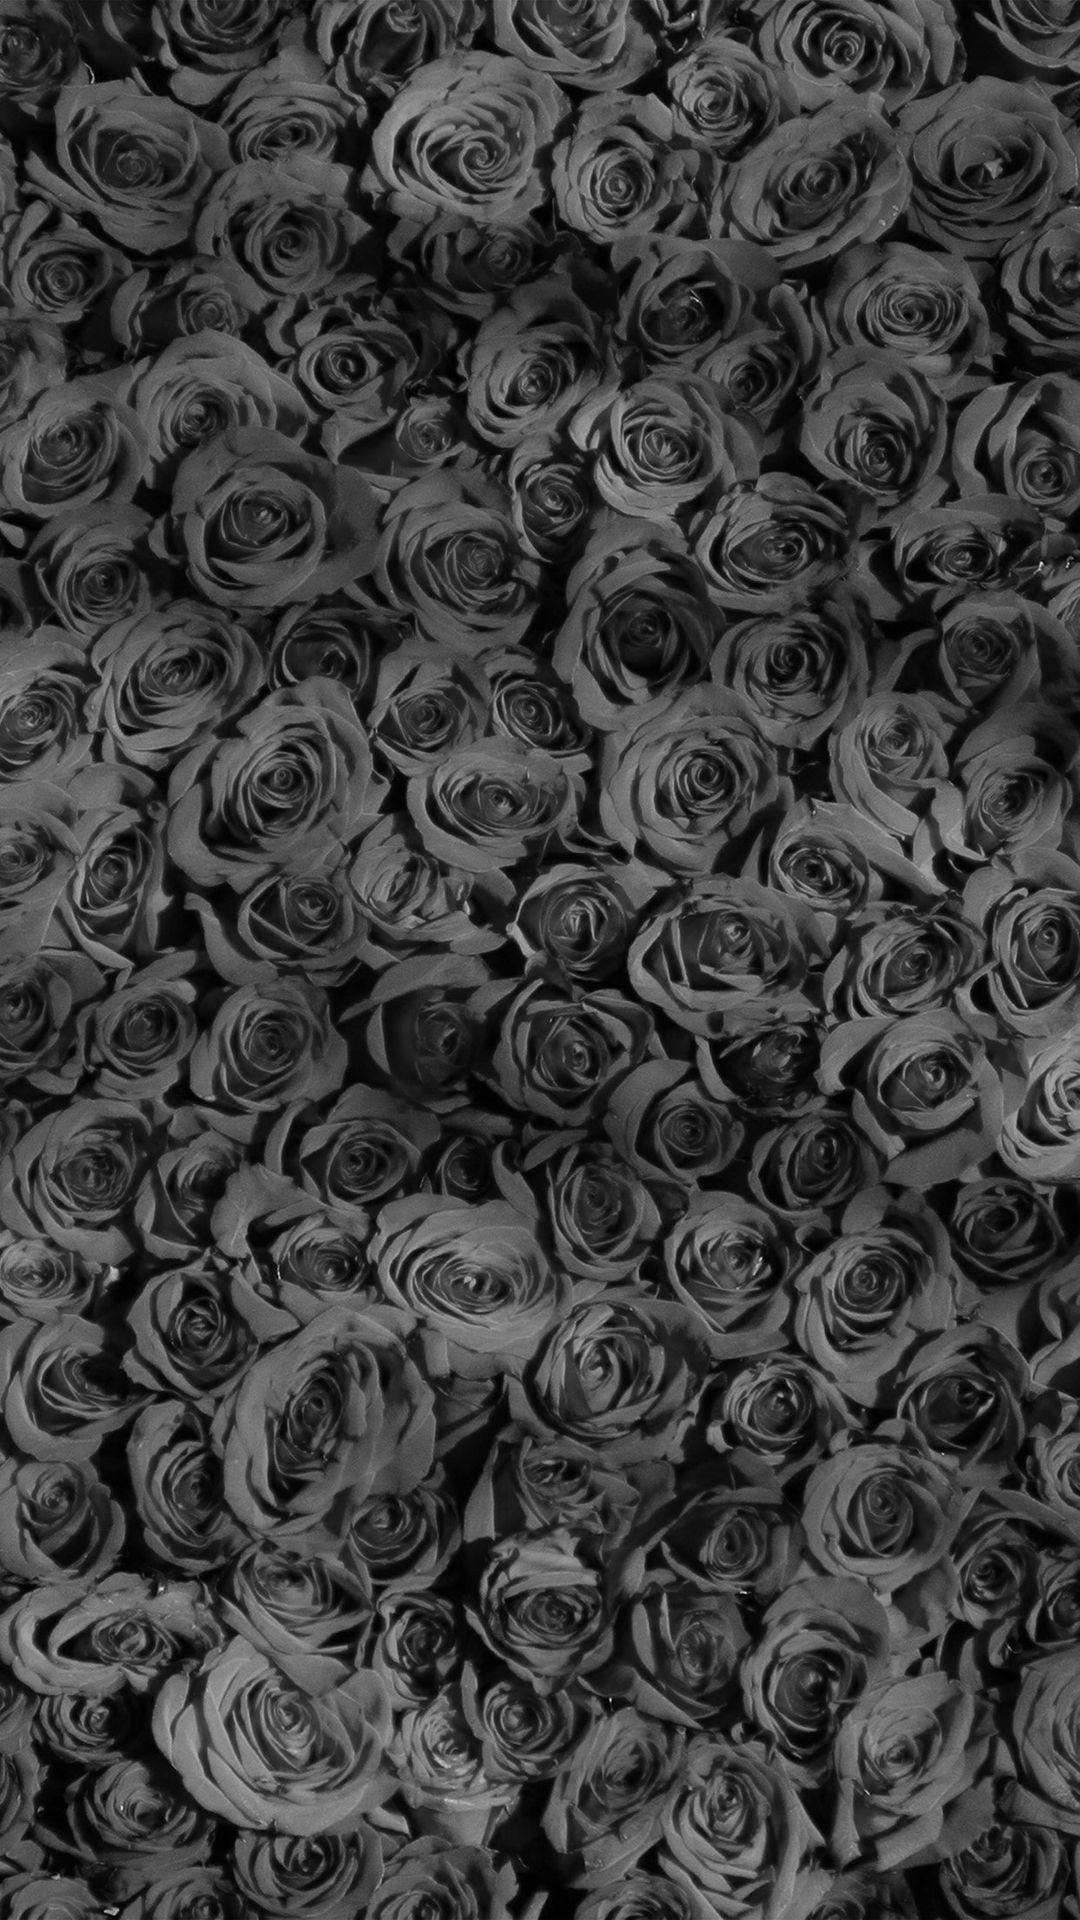 Rose Dark Bw Pattern Background Iphone 8 Wallpaper Grey